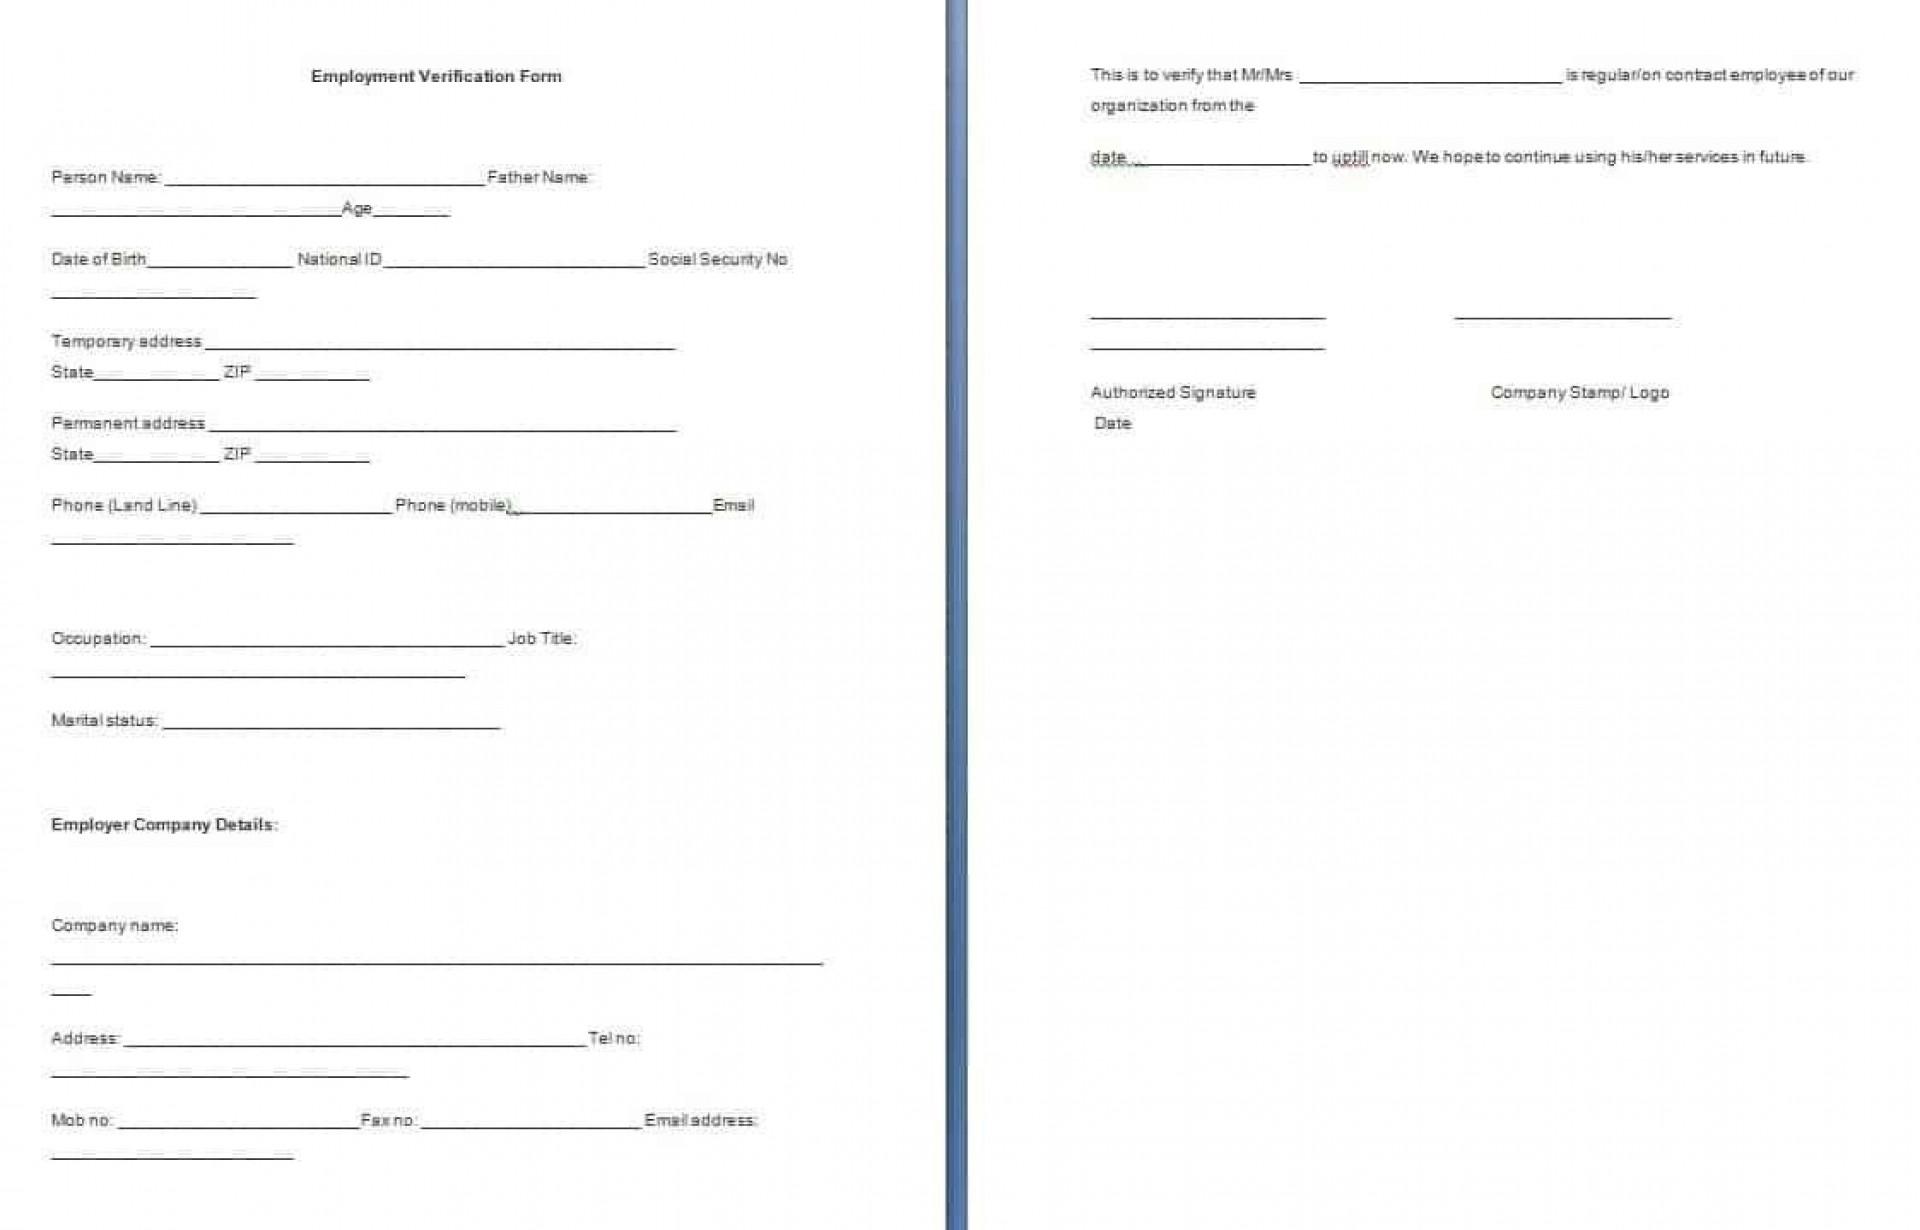 001 Dreaded Employment Verification Form Template Example  Templates Previou Past Printable1920